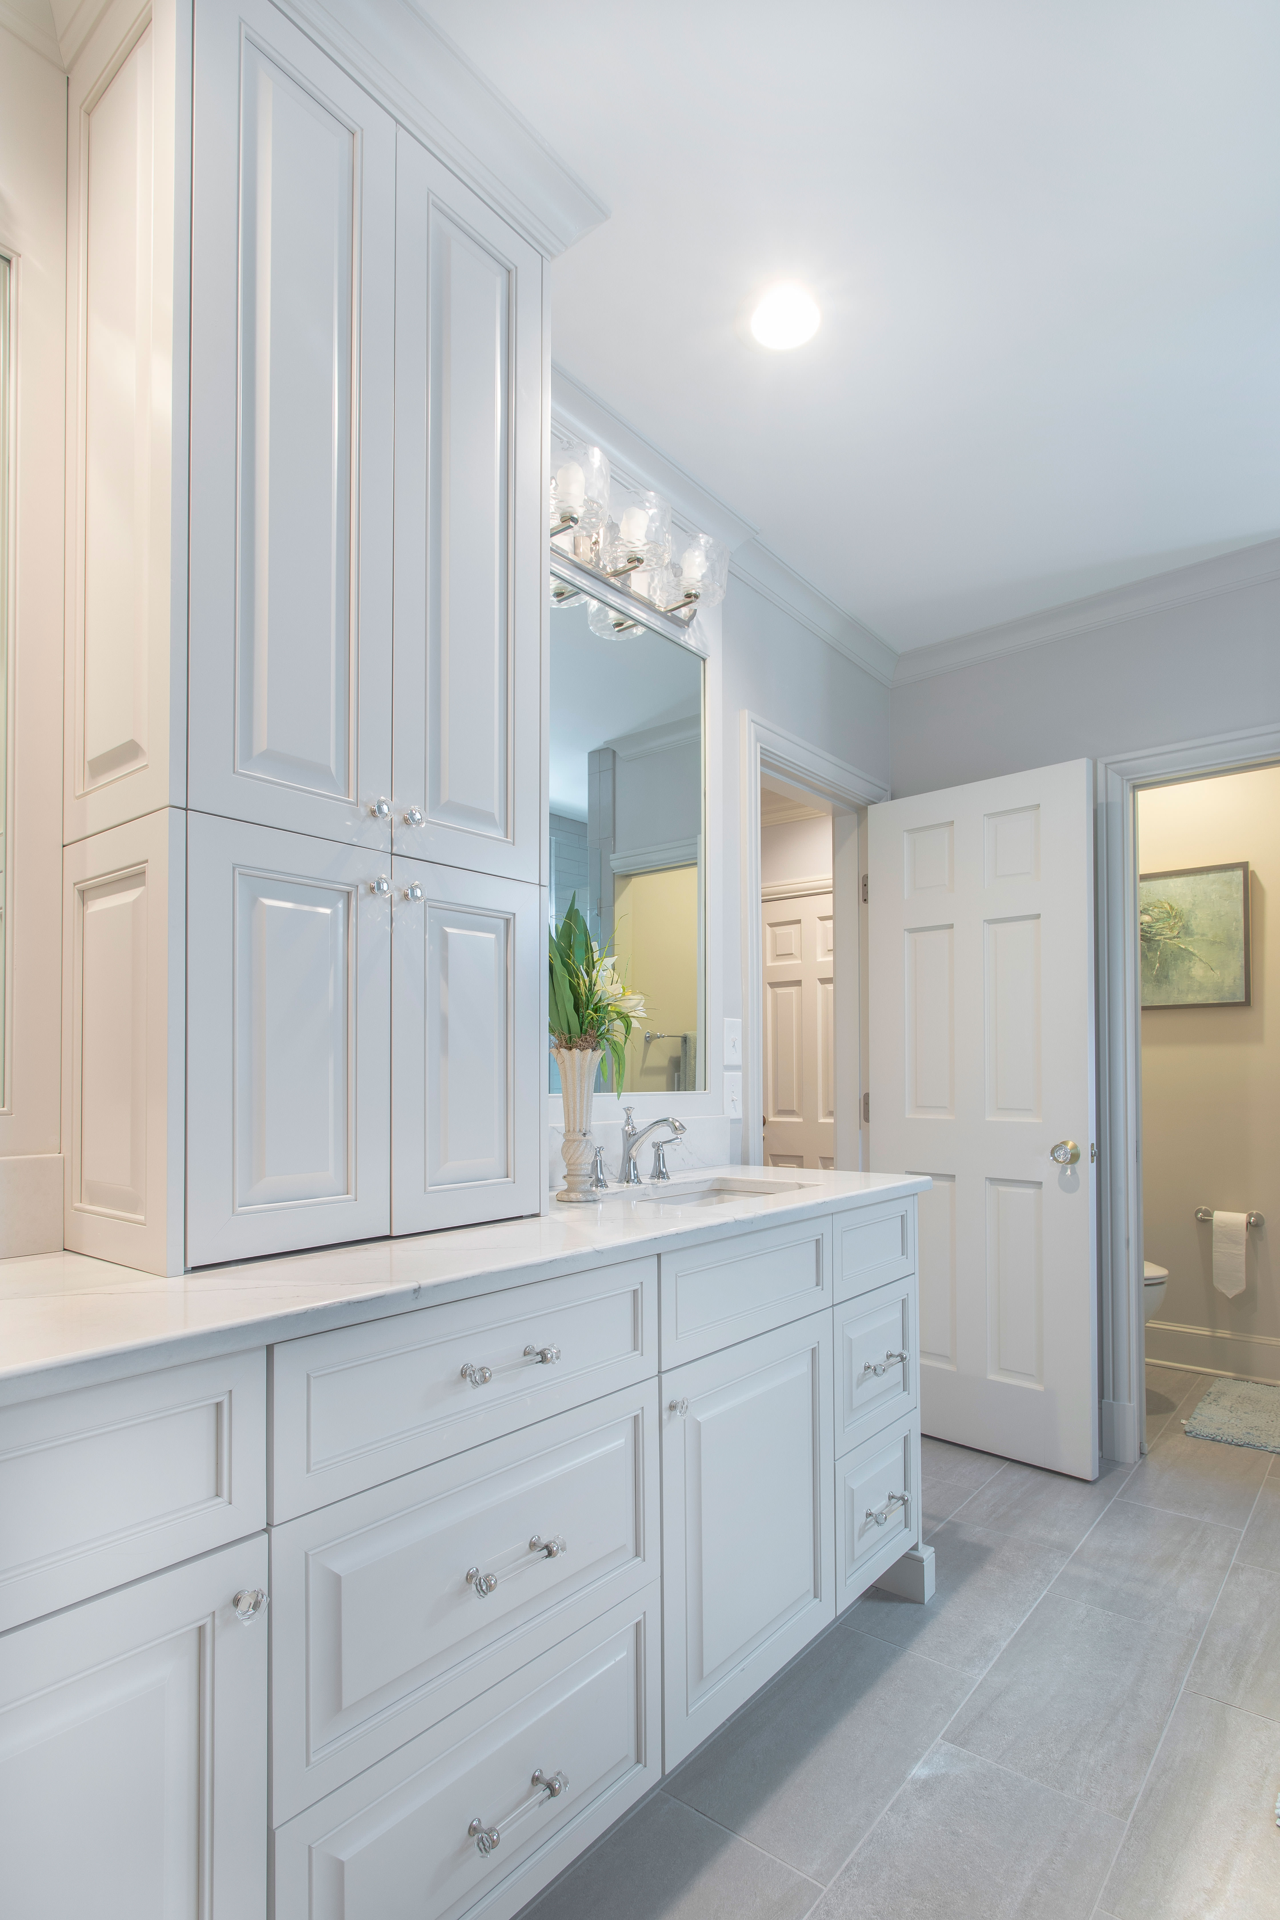 Cabico-essence-semi-custom-cabinets,-white-bathroom ...